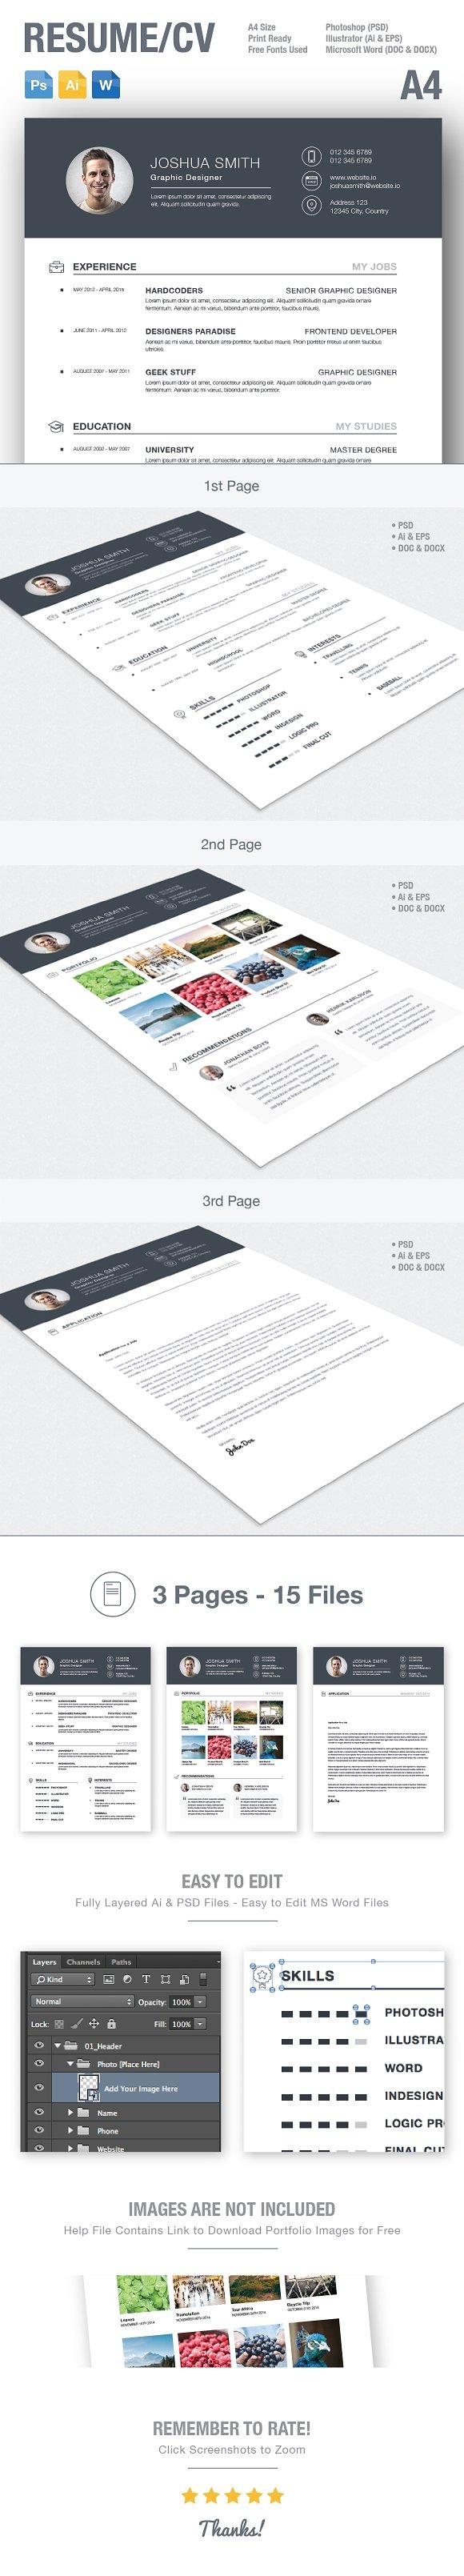 resume cv template ai psd docx resume templates creative market